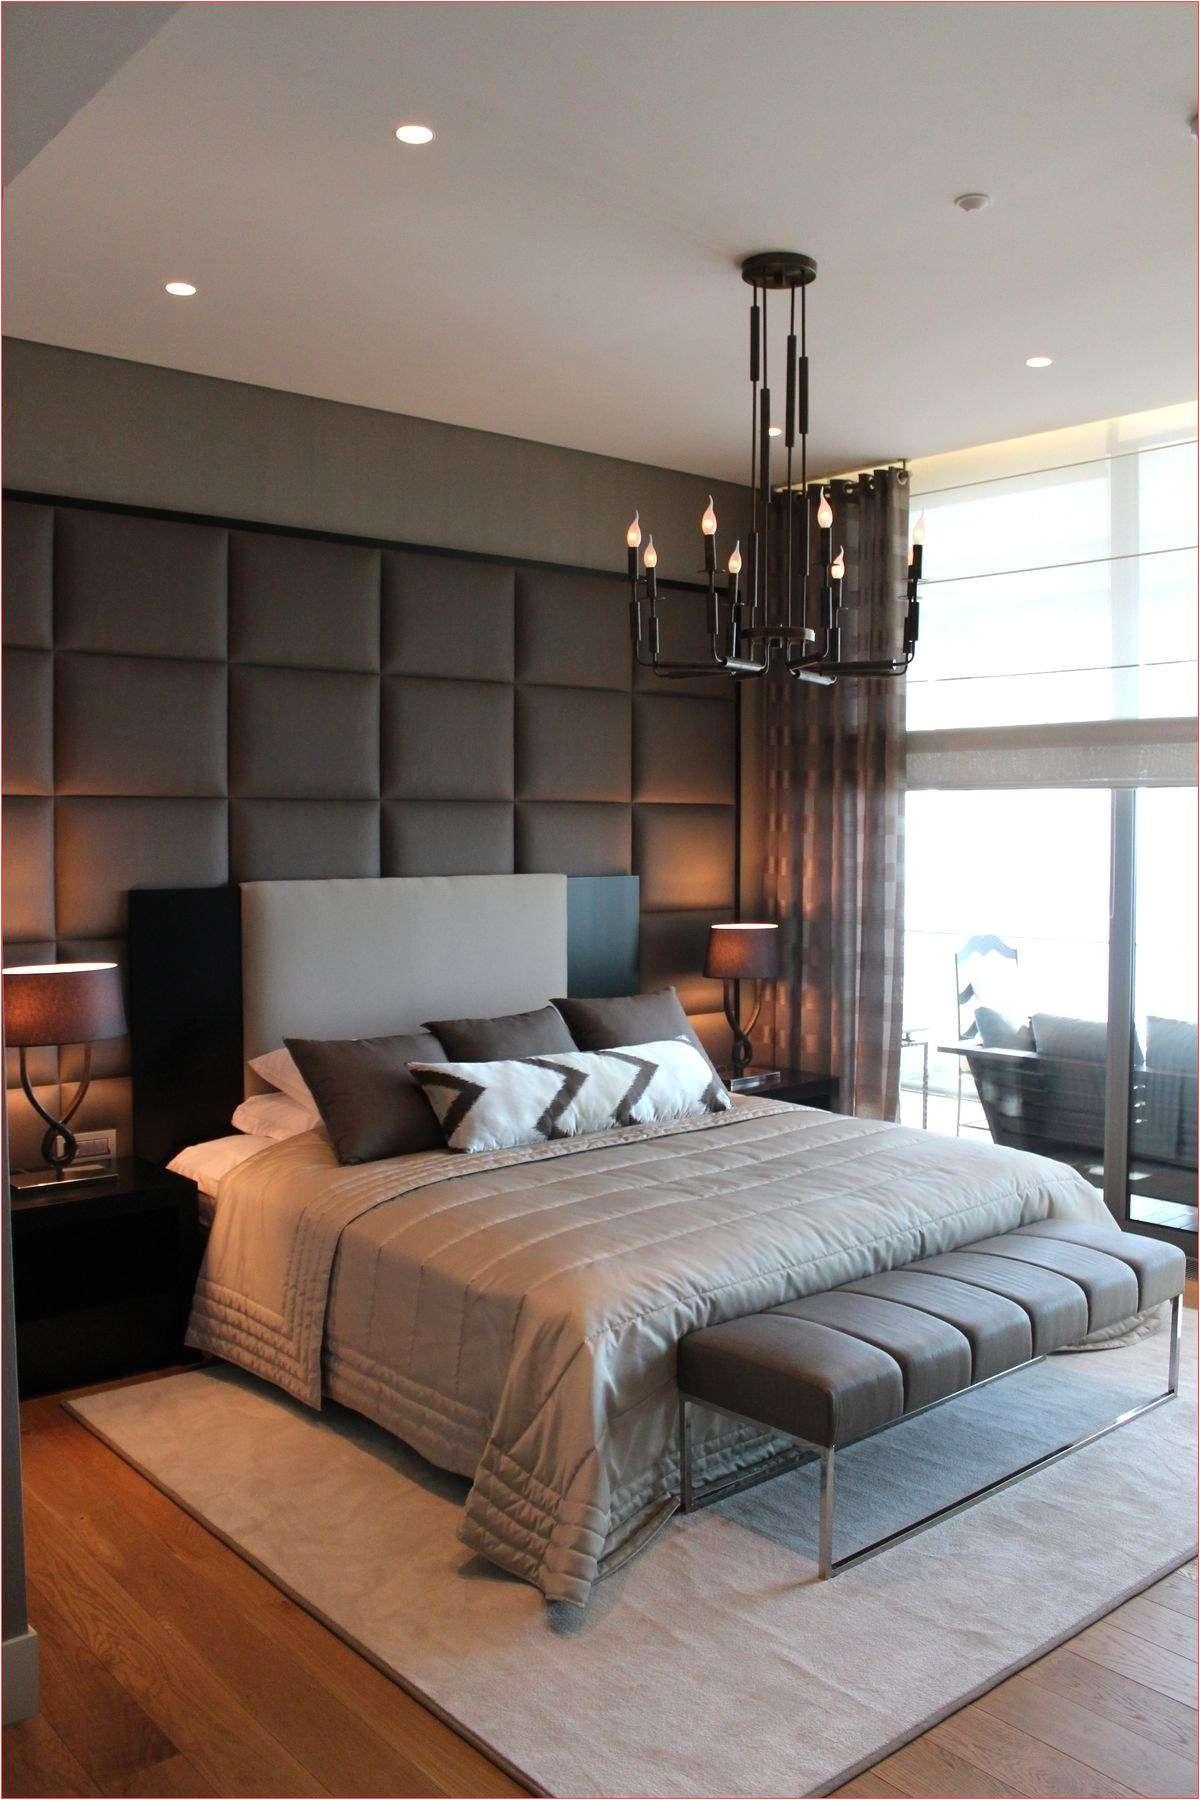 Cheap Bedroom Sets 36 Best Of Bedroom Set Ideas Exitrealestate540